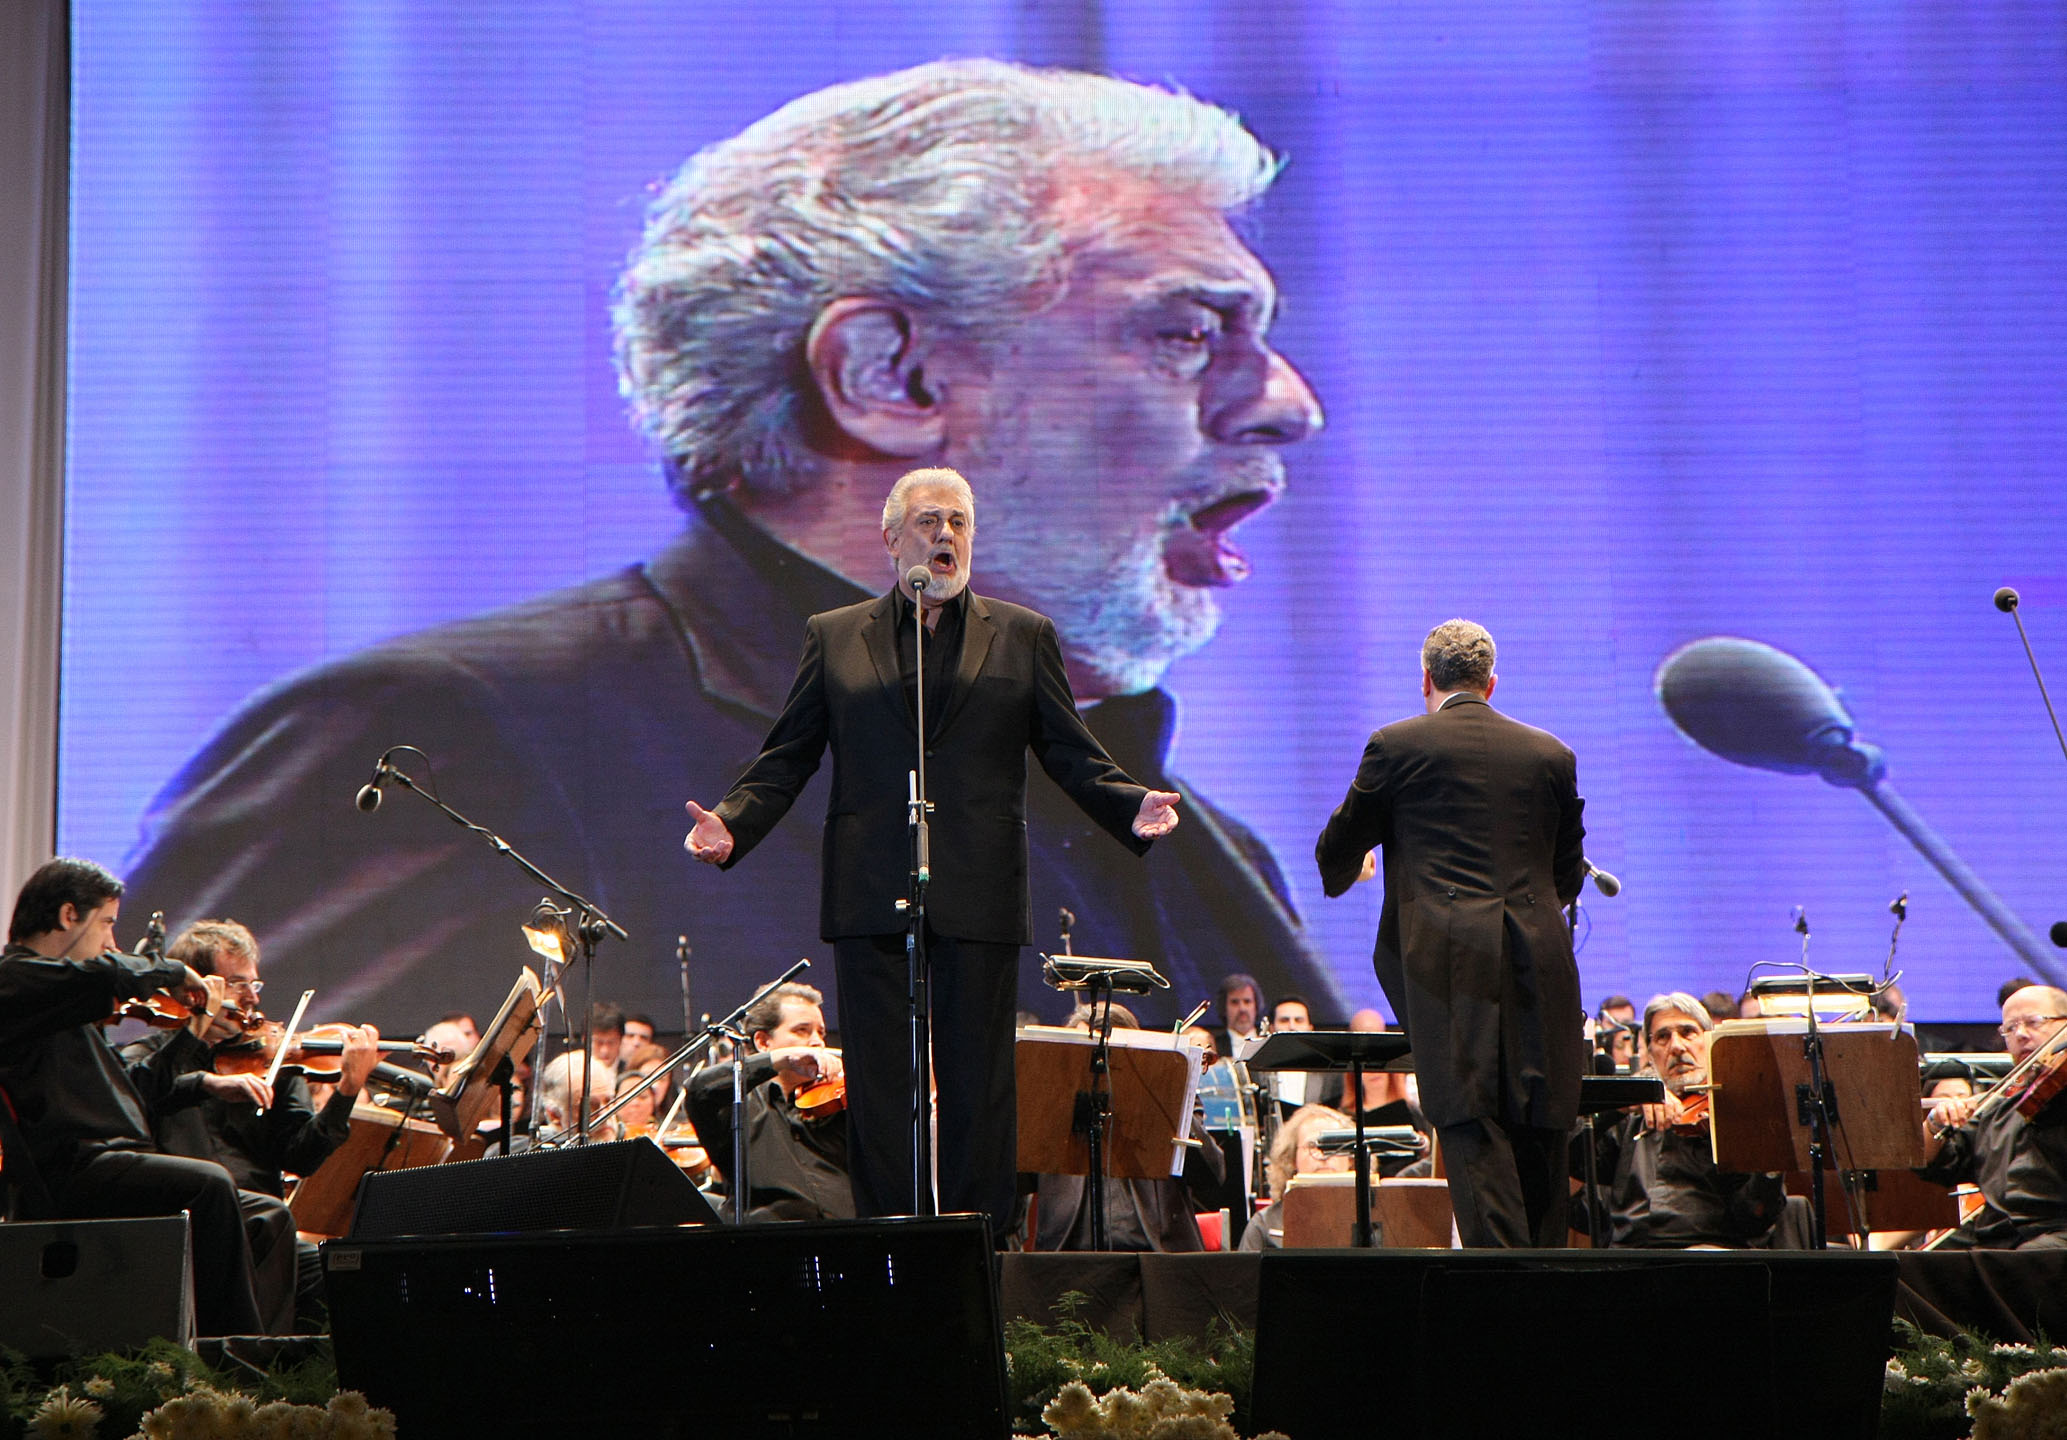 Placido_Domingo%2C_Buenos_Aires_concert_2011.jpg